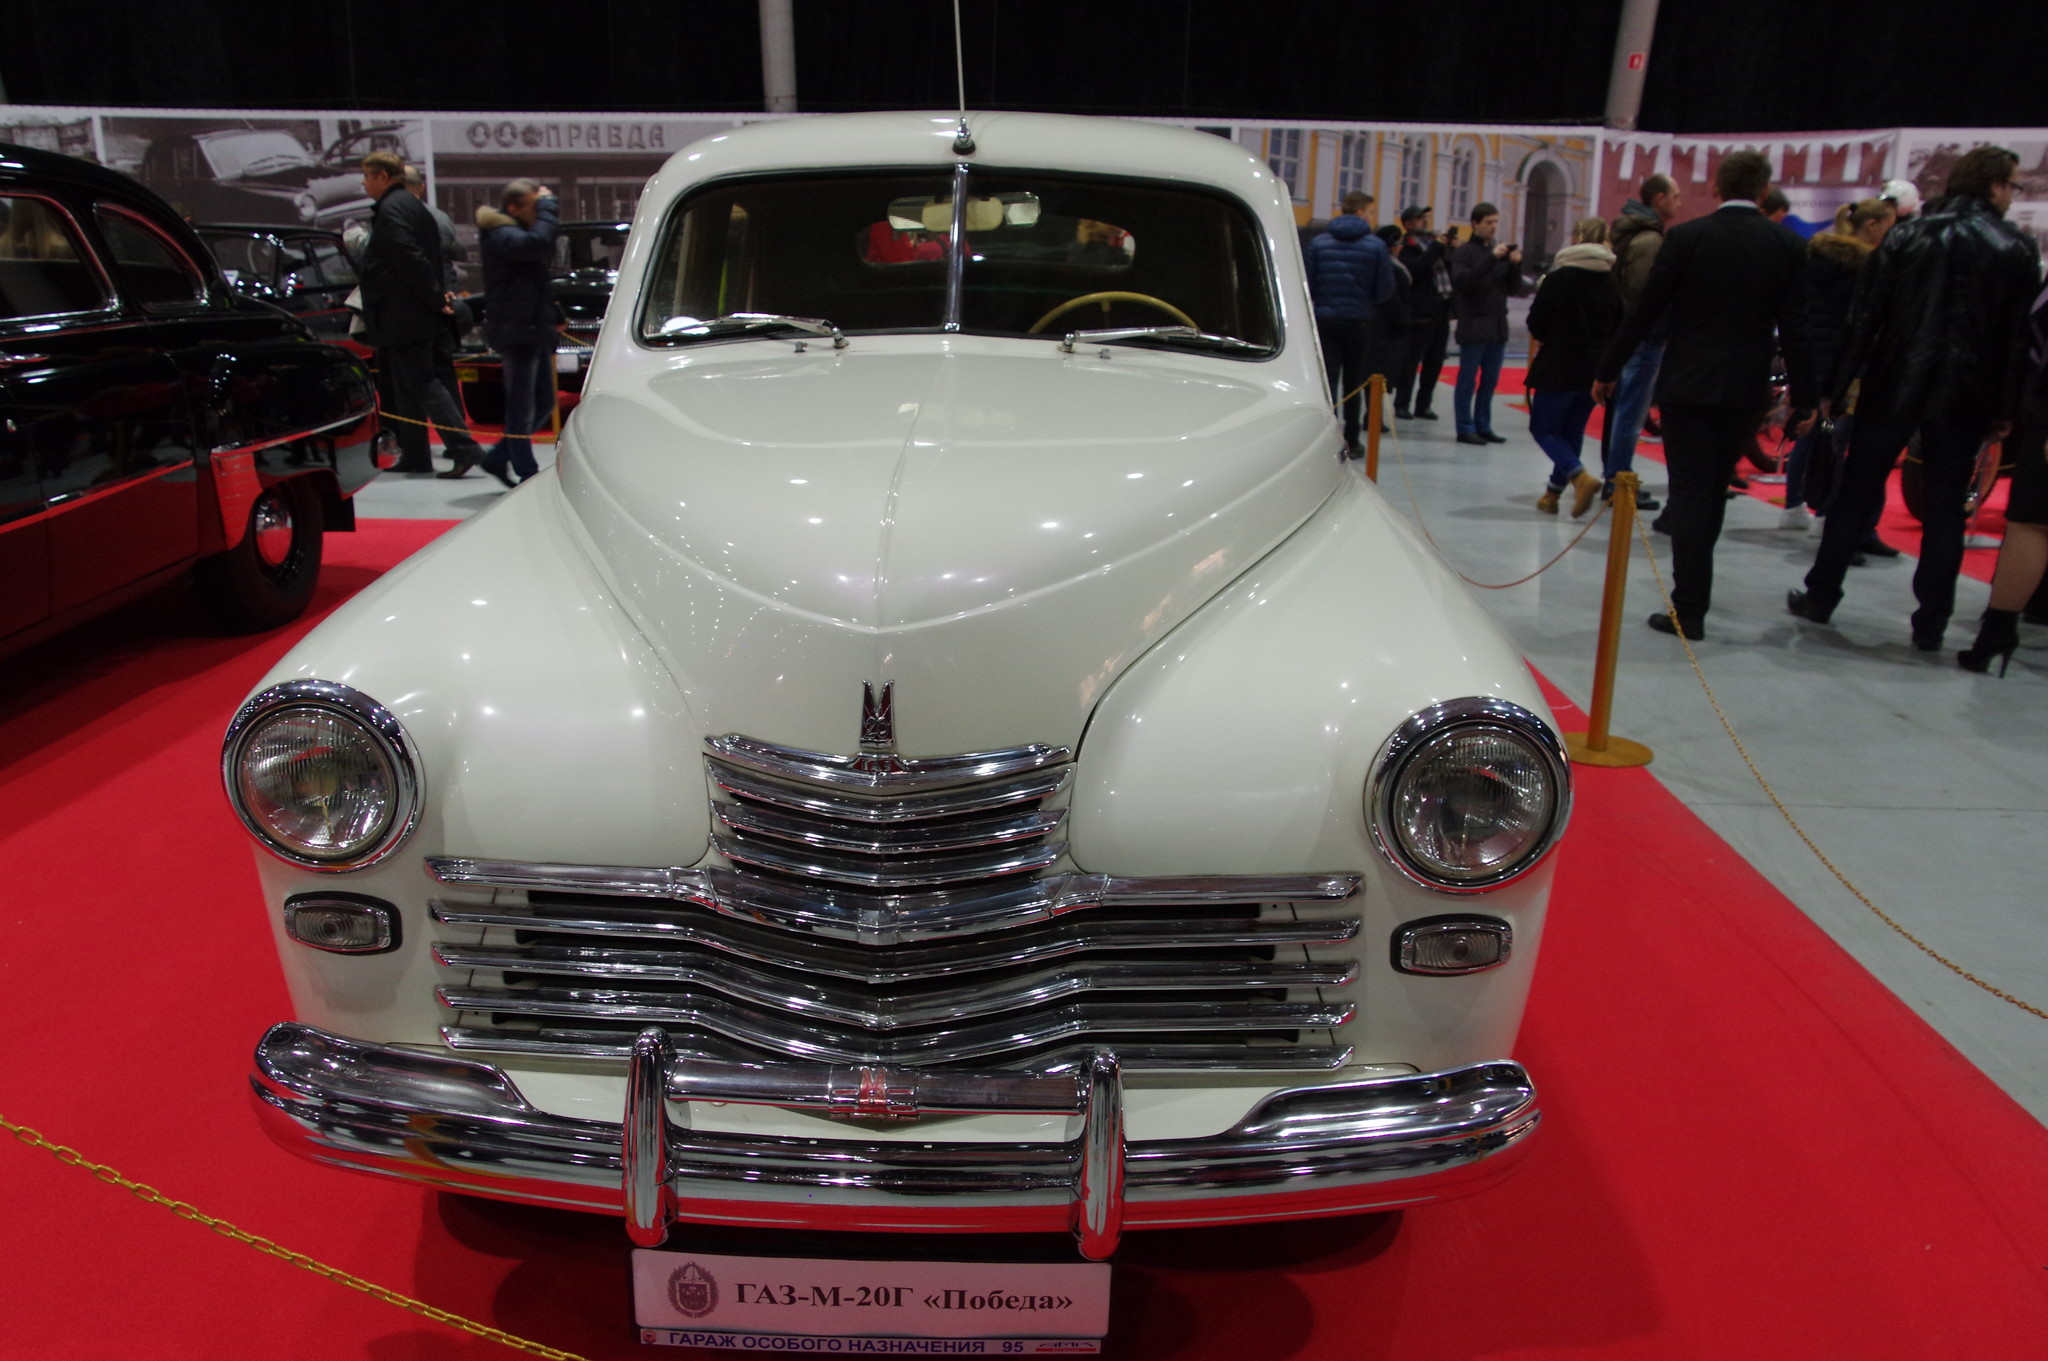 Автомобиль ГАЗ-М-20Г «Победа»